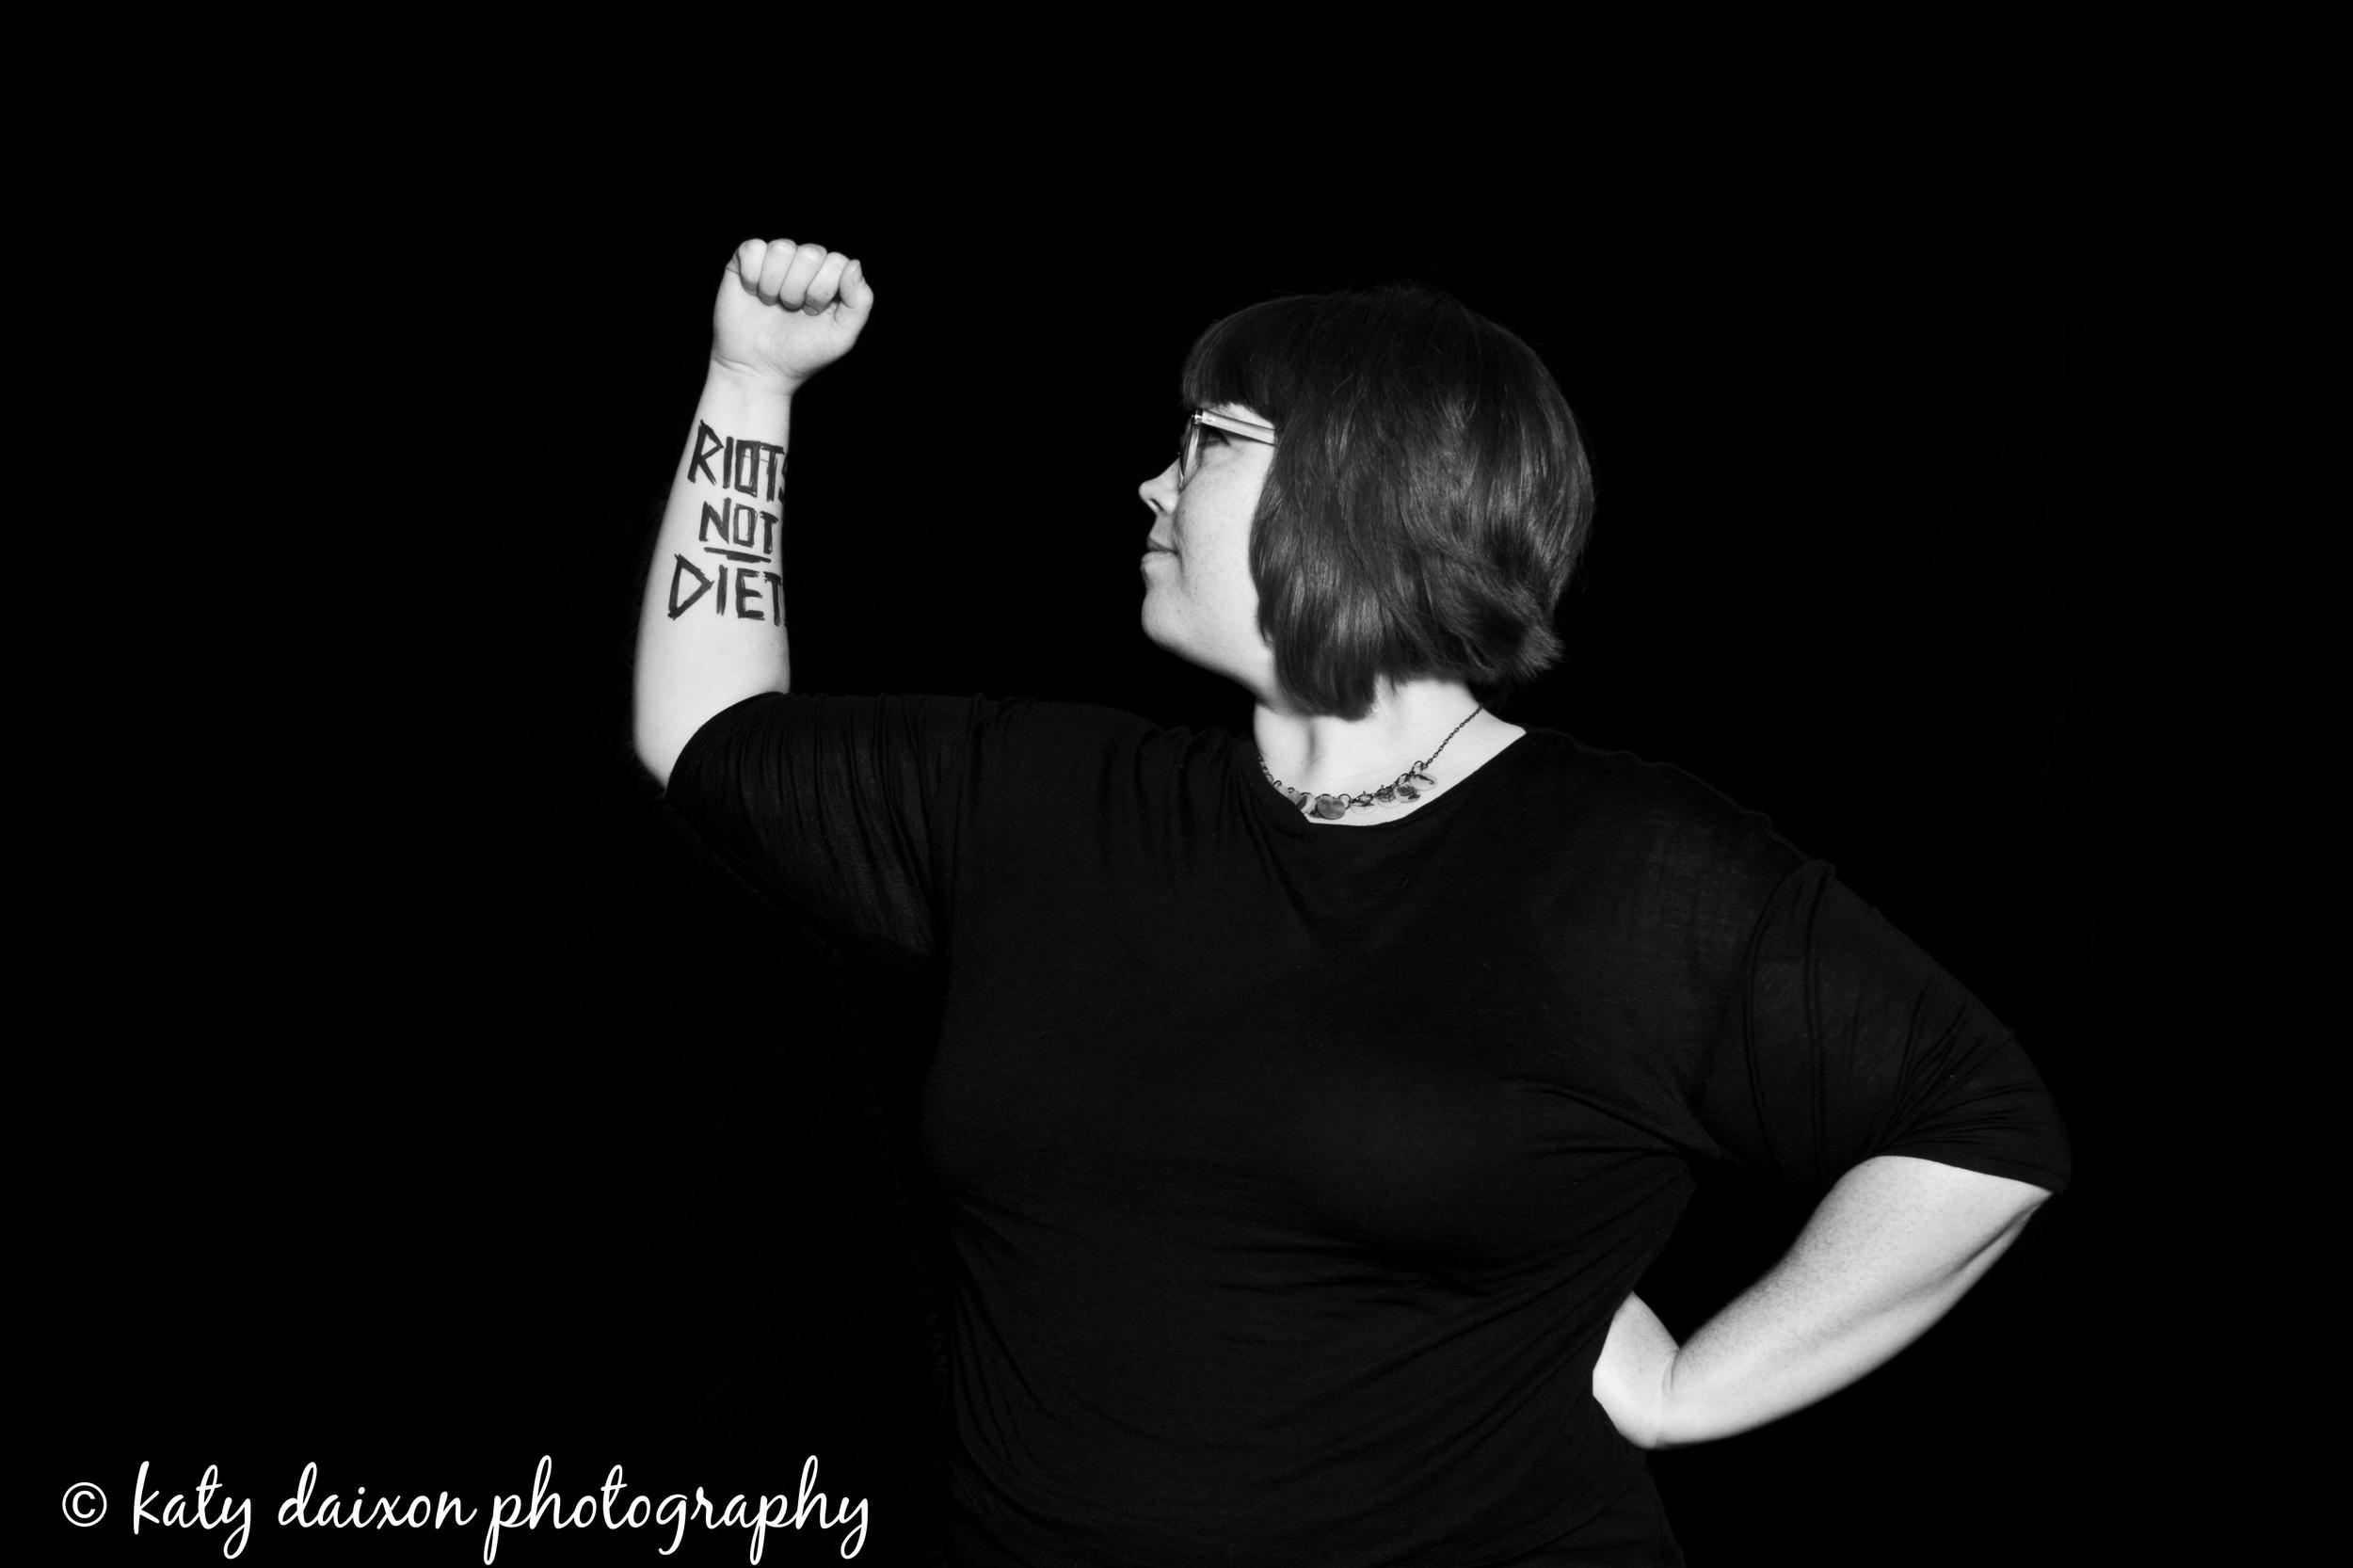 the-body-project-katy-daixon-photography-99.jpg